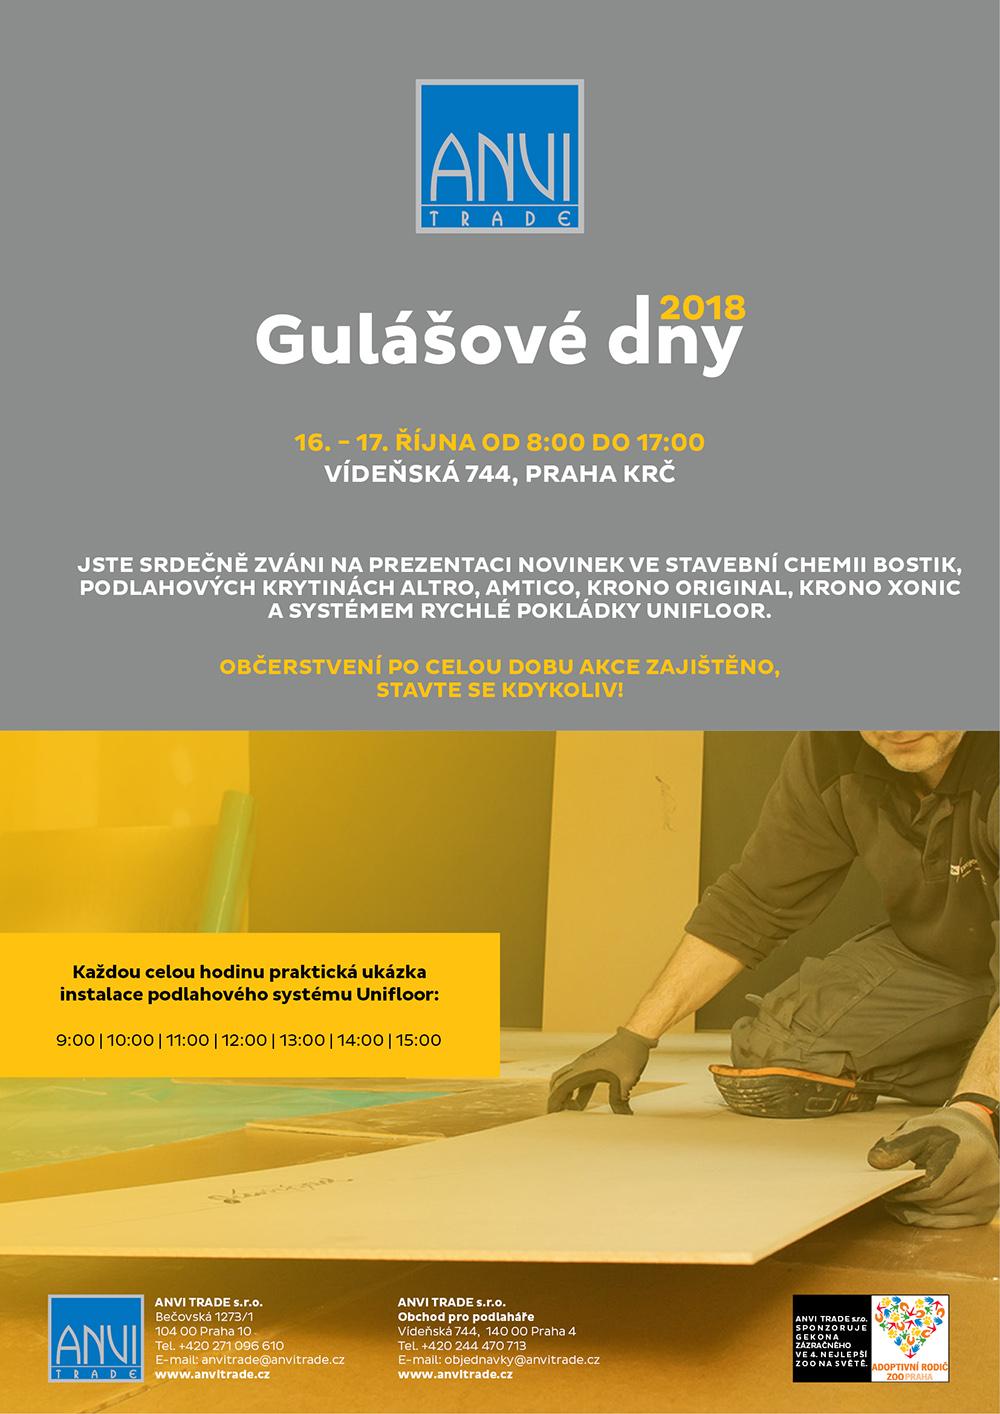 gulasove-dny-2018